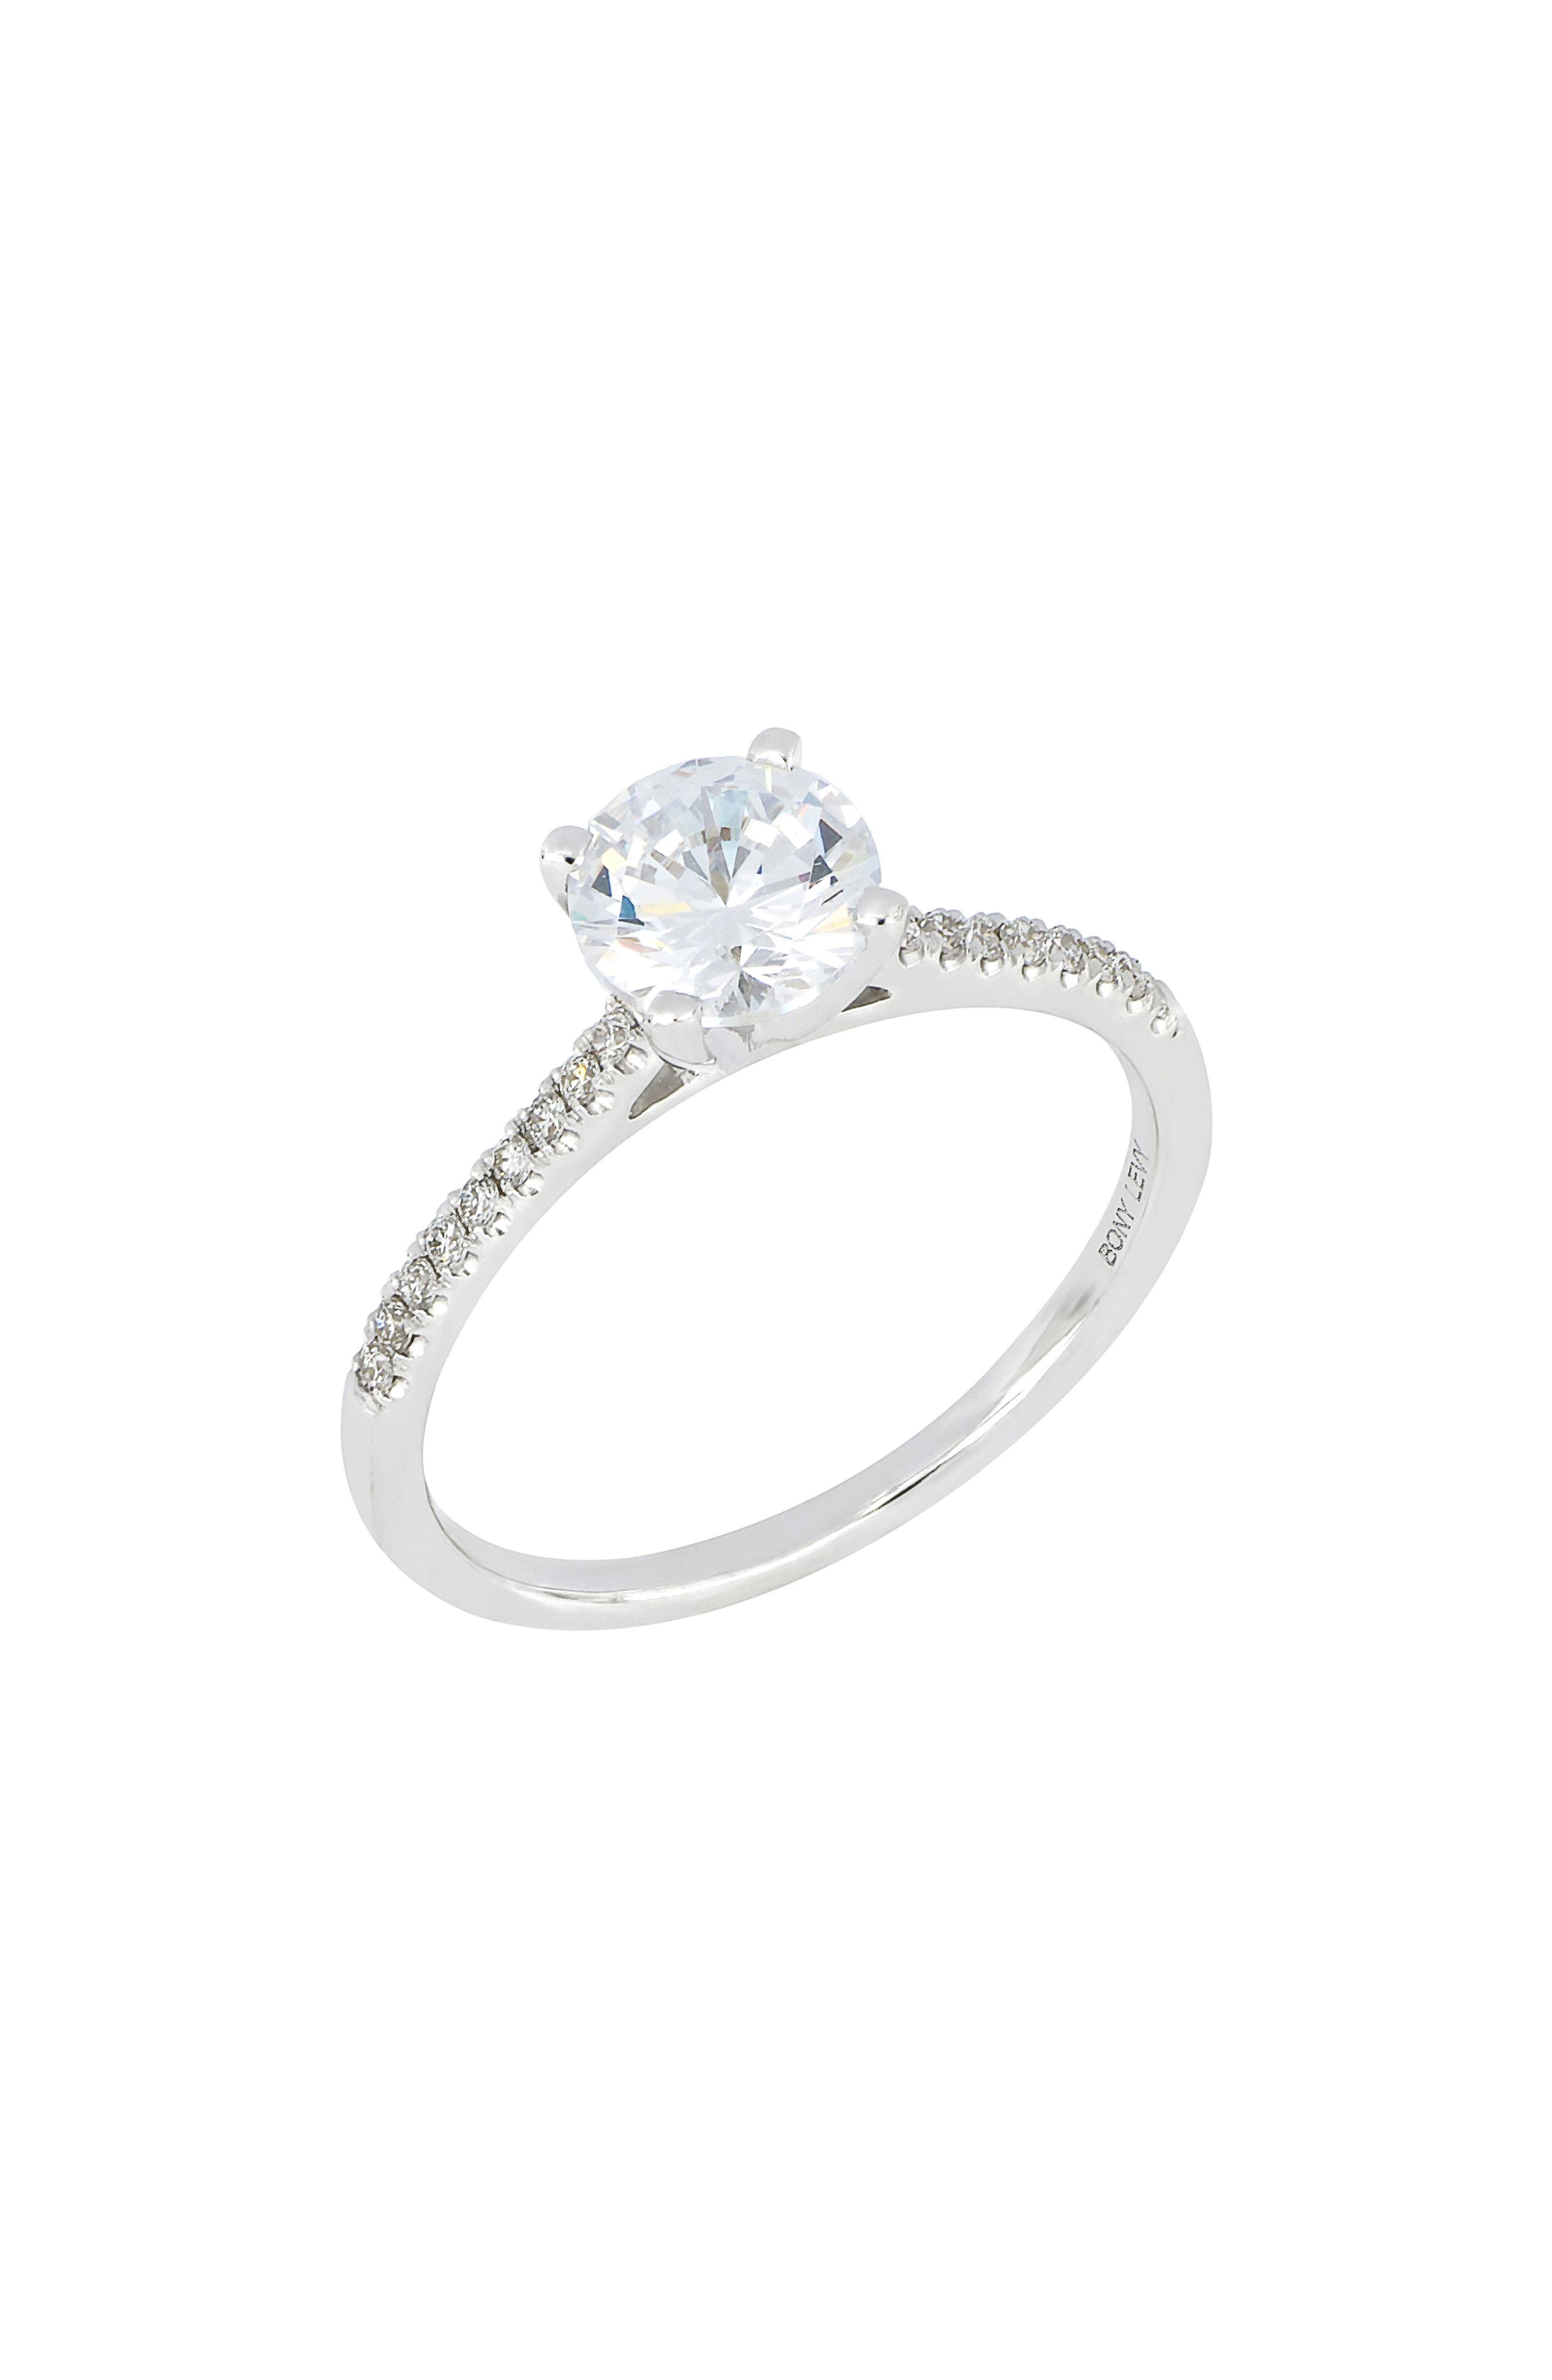 Pavé Diamond Round Engagement Ring Setting,                             Main thumbnail 1, color,                             711